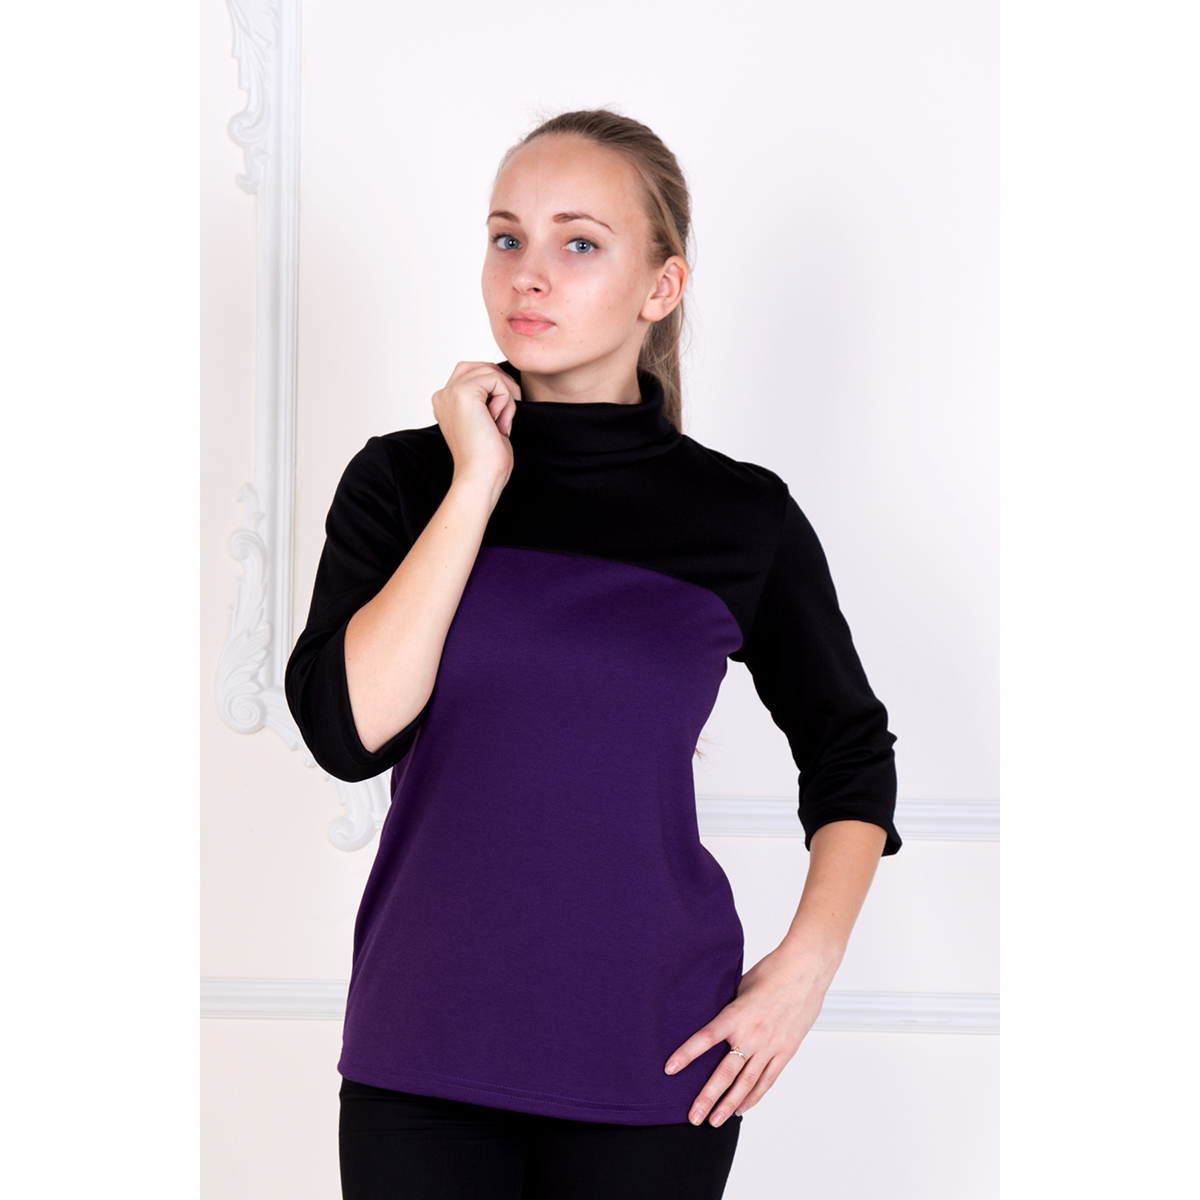 Женская блуза Сити, размер 46Блузы<br>Обхват груди:92 см<br>Обхват талии:74 см<br>Обхват бедер:100 см<br>Рост:167 см<br><br>Тип: Жен. блуза<br>Размер: 46<br>Материал: Милано